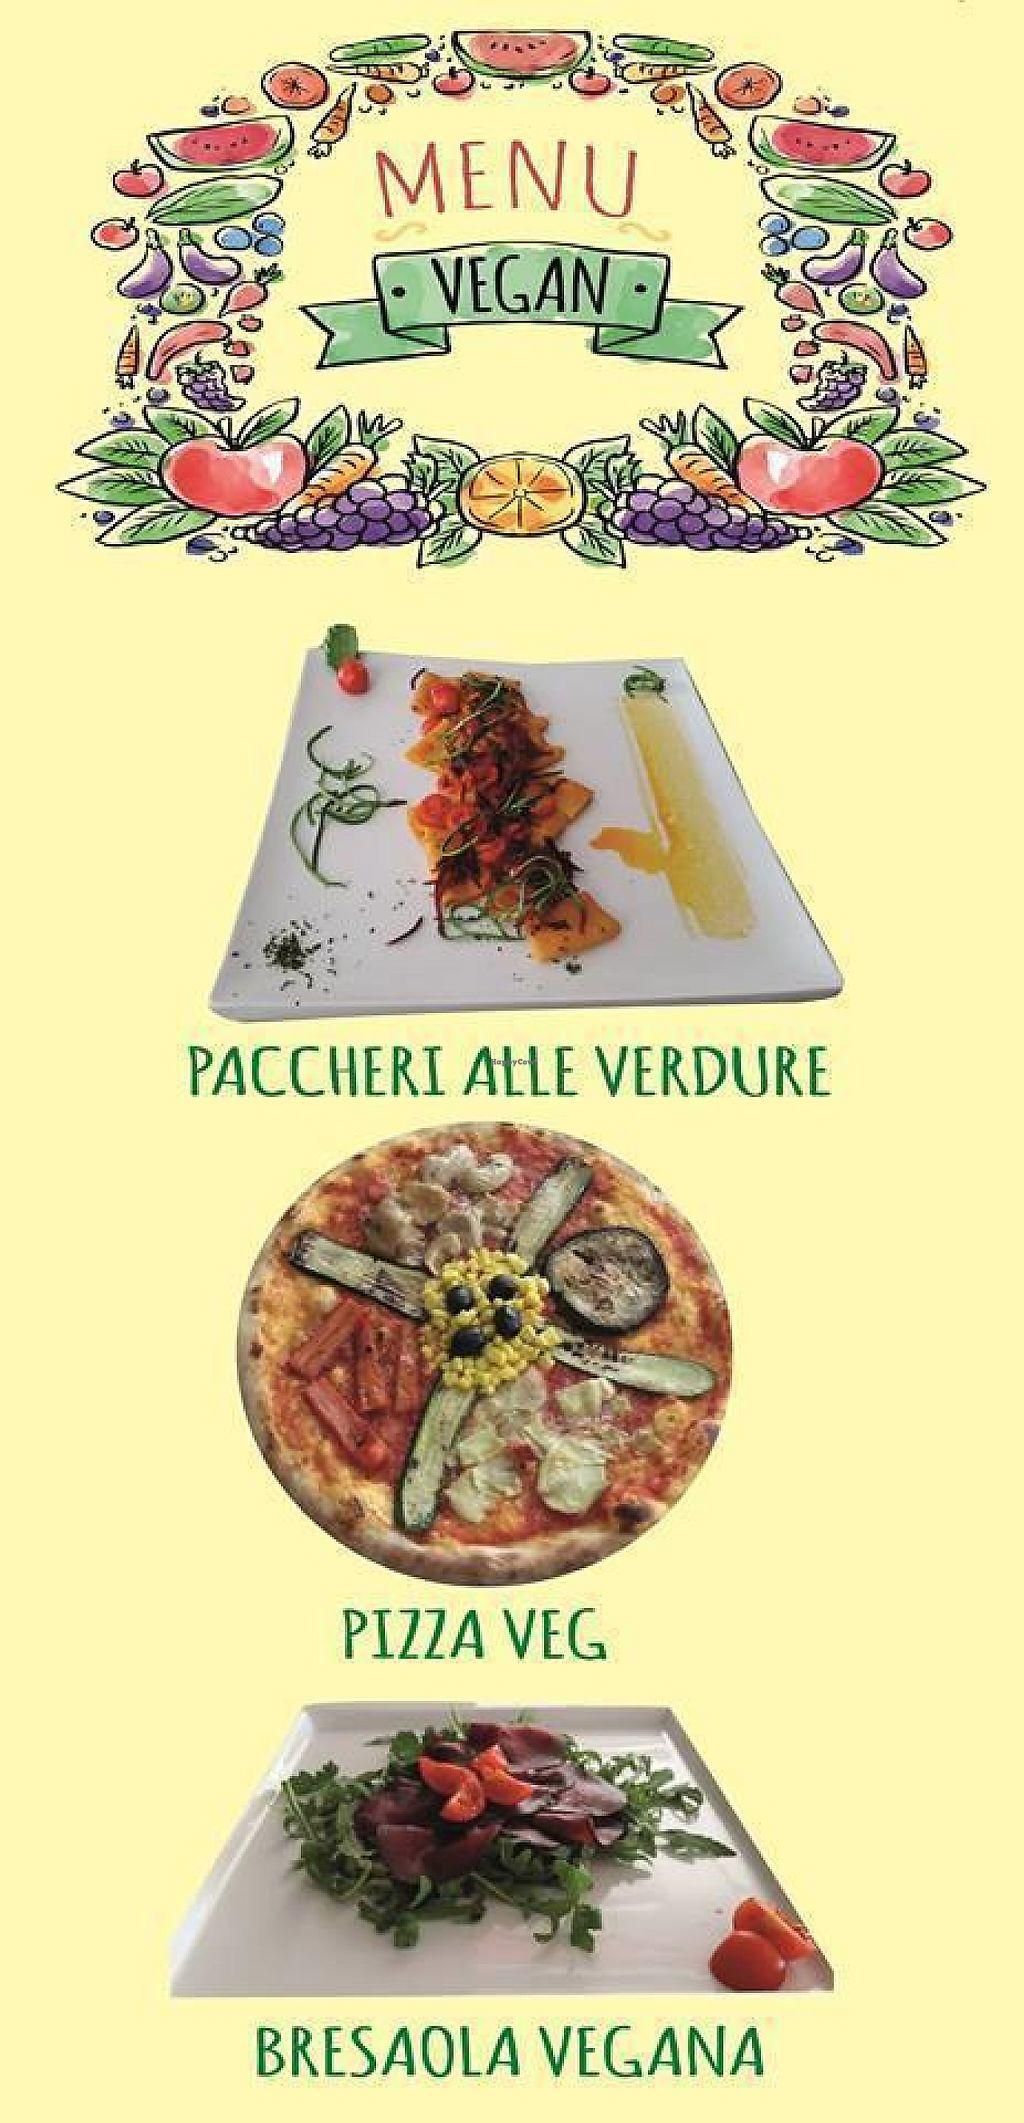 "Photo of Ristorante Pizzeria Morena  by <a href=""/members/profile/community5"">community5</a> <br/>Vegan menu <br/> June 5, 2017  - <a href='/contact/abuse/image/93360/266035'>Report</a>"